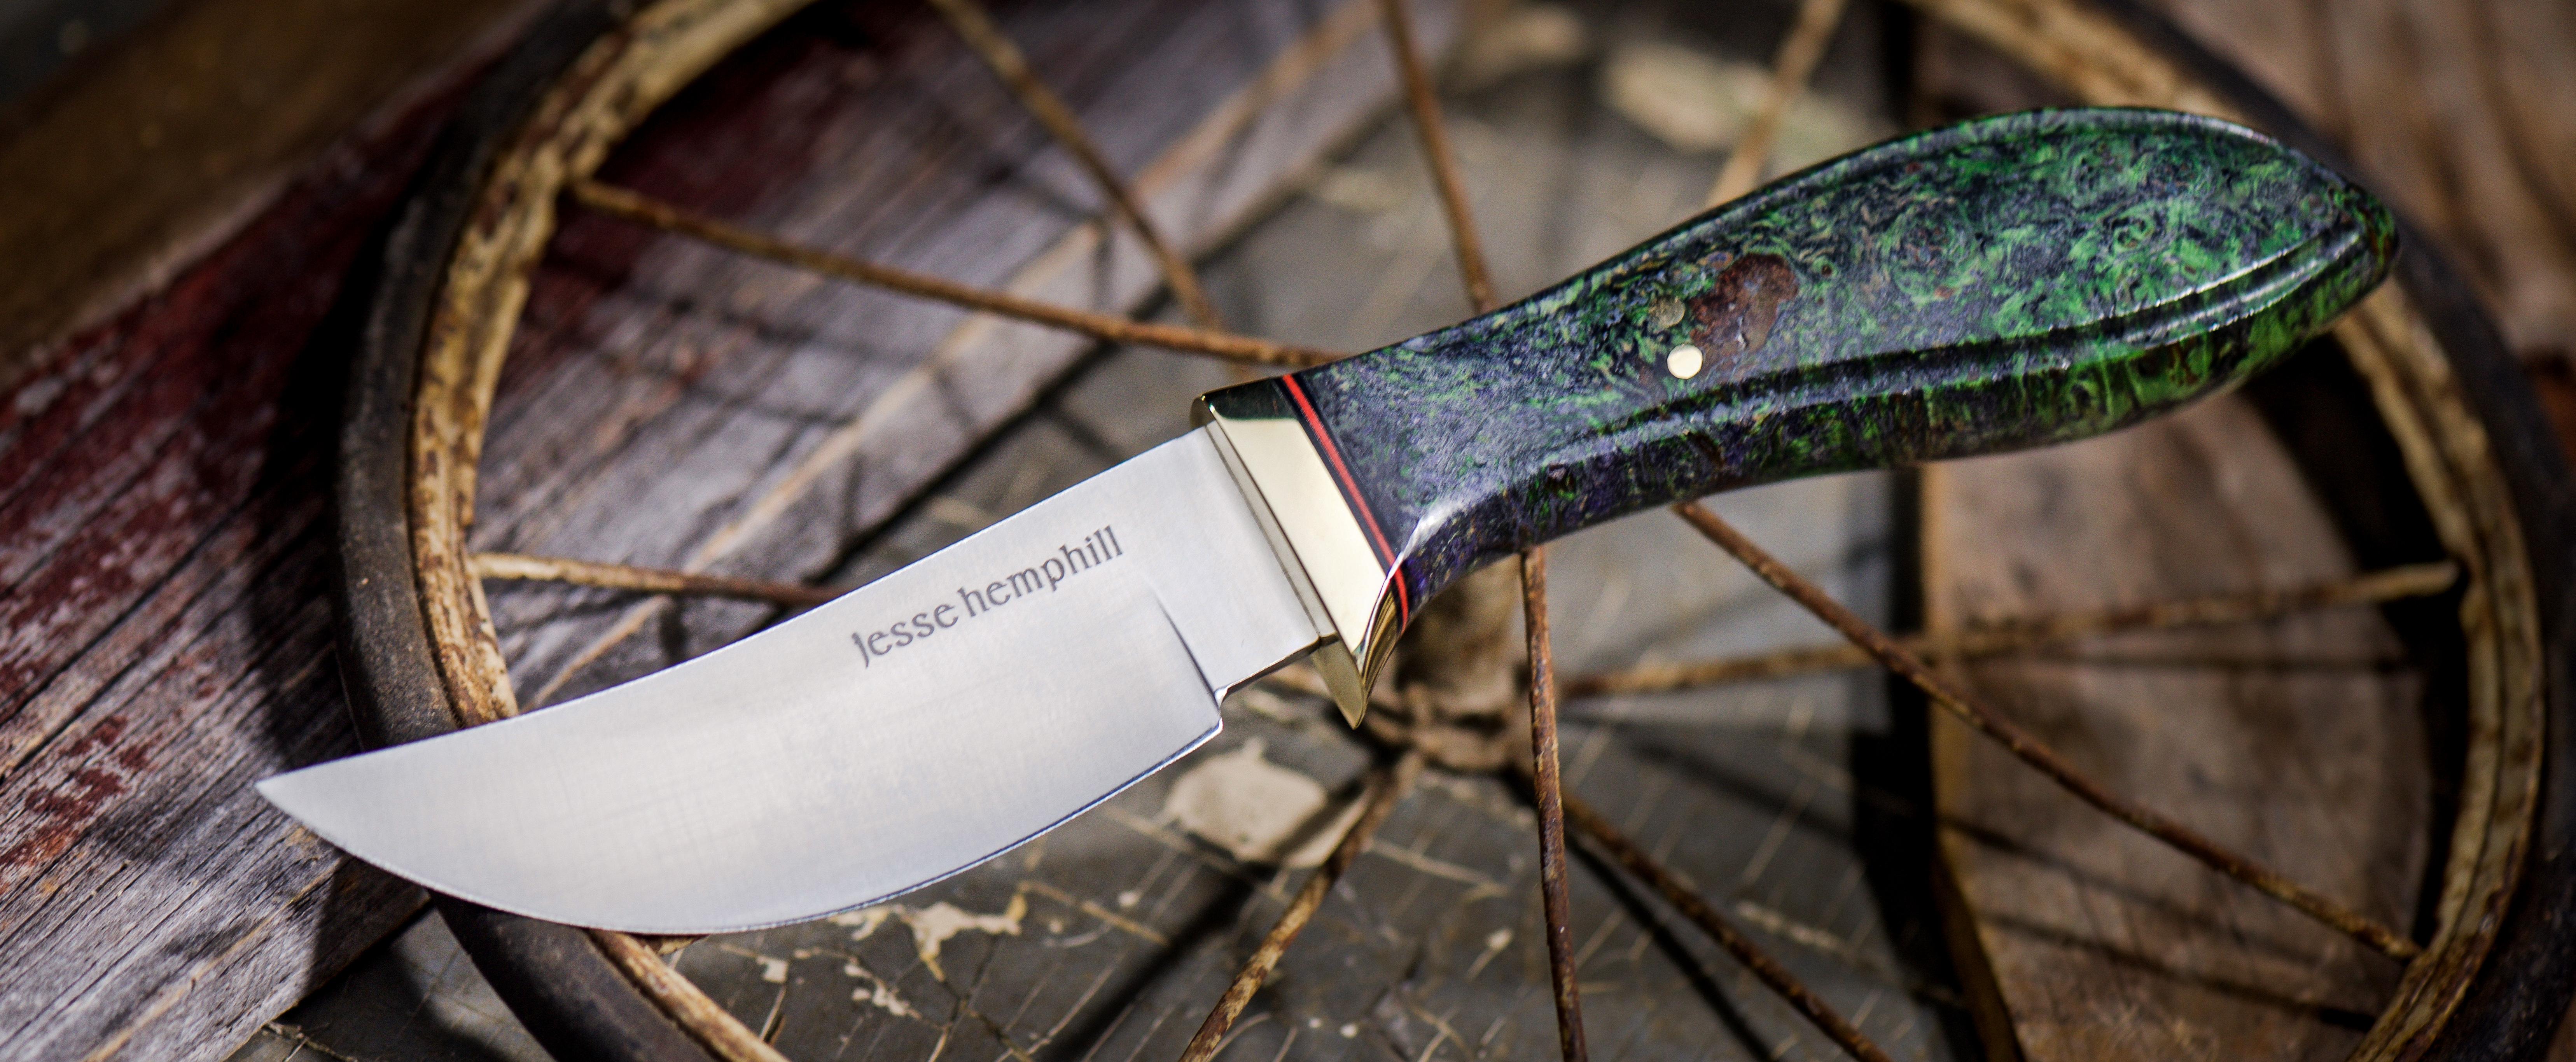 Jesse Hemphill Knives - High Falls